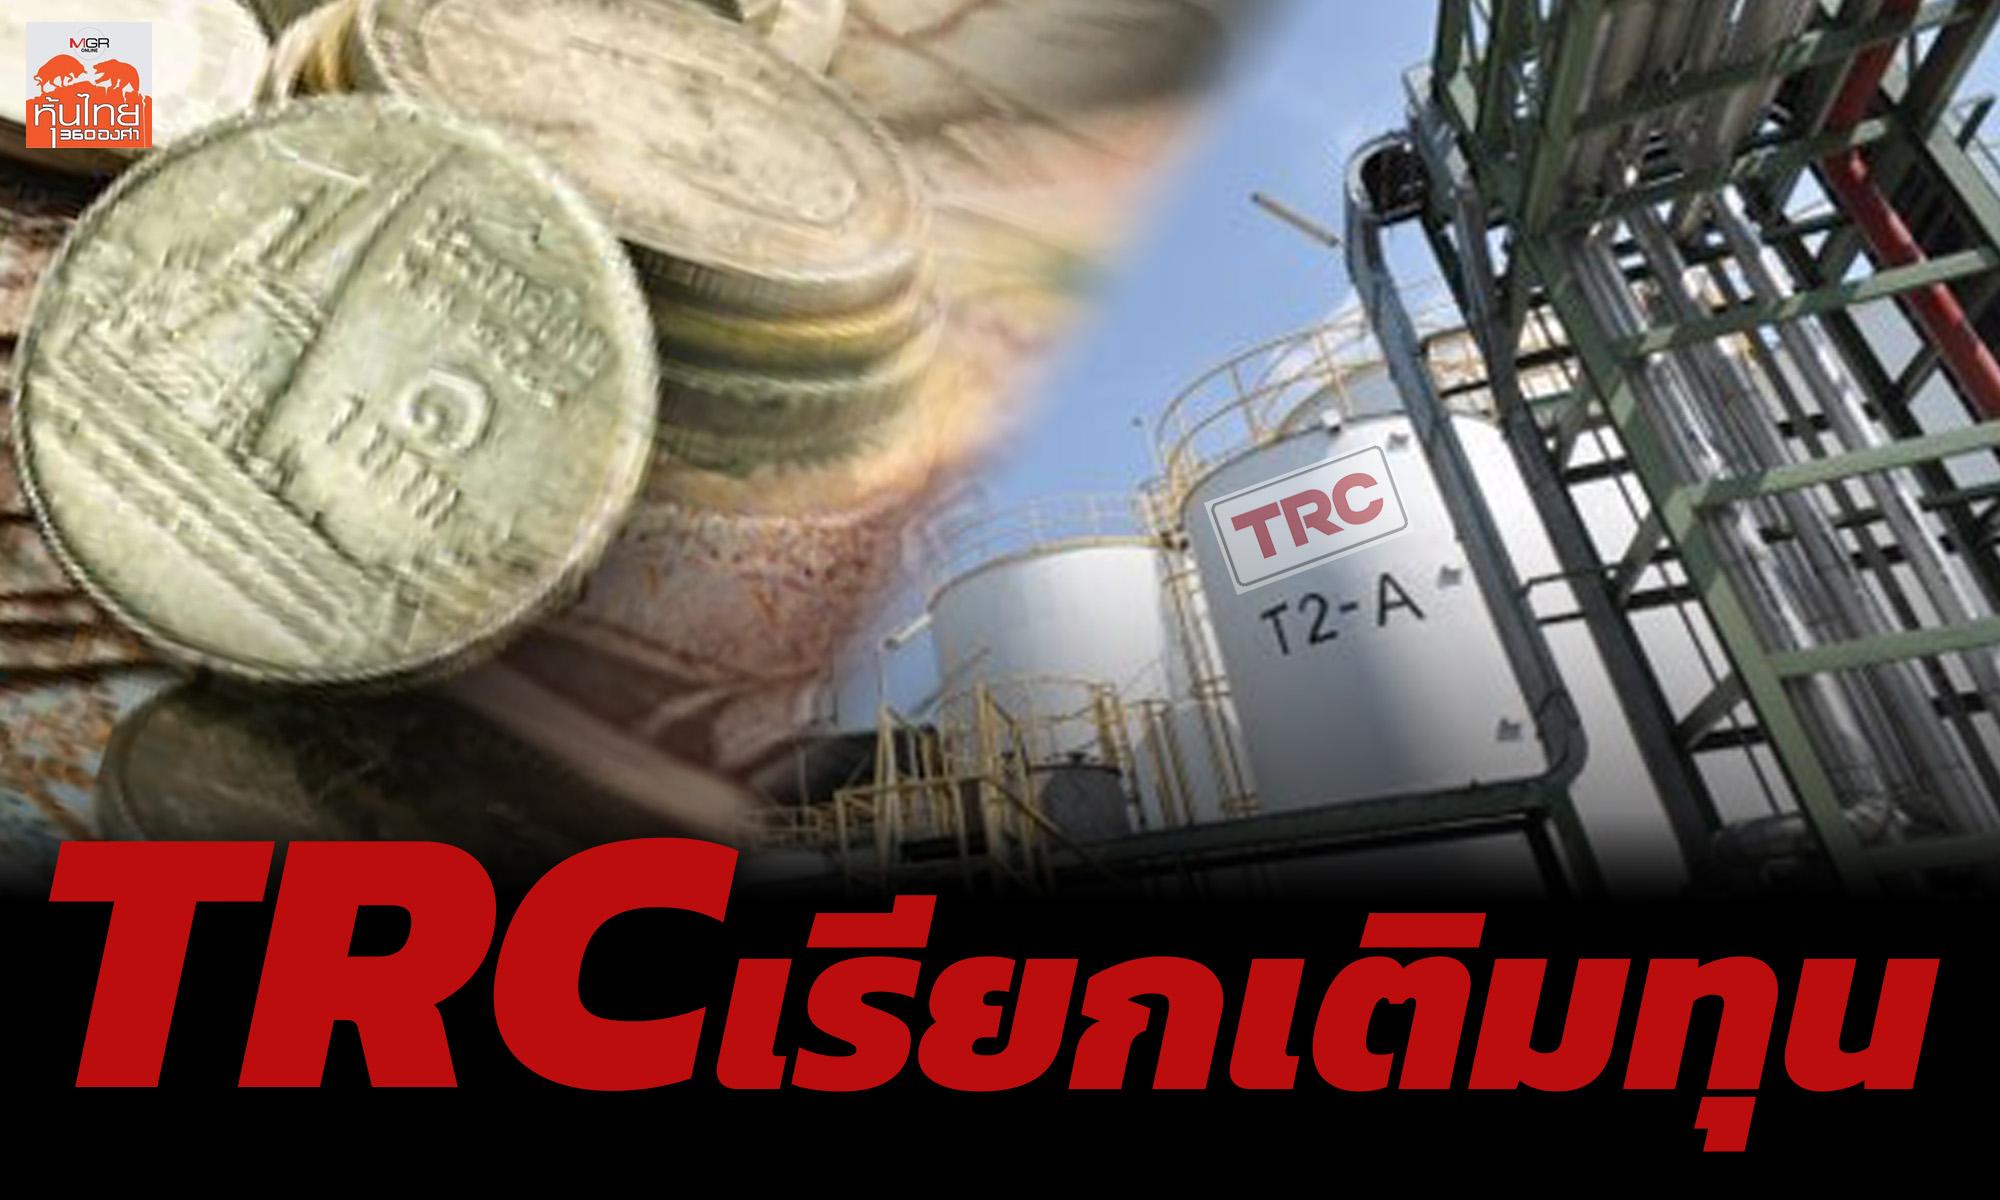 TRC เรียกเติมทุน / สุนันท์ ศรีจันทรา